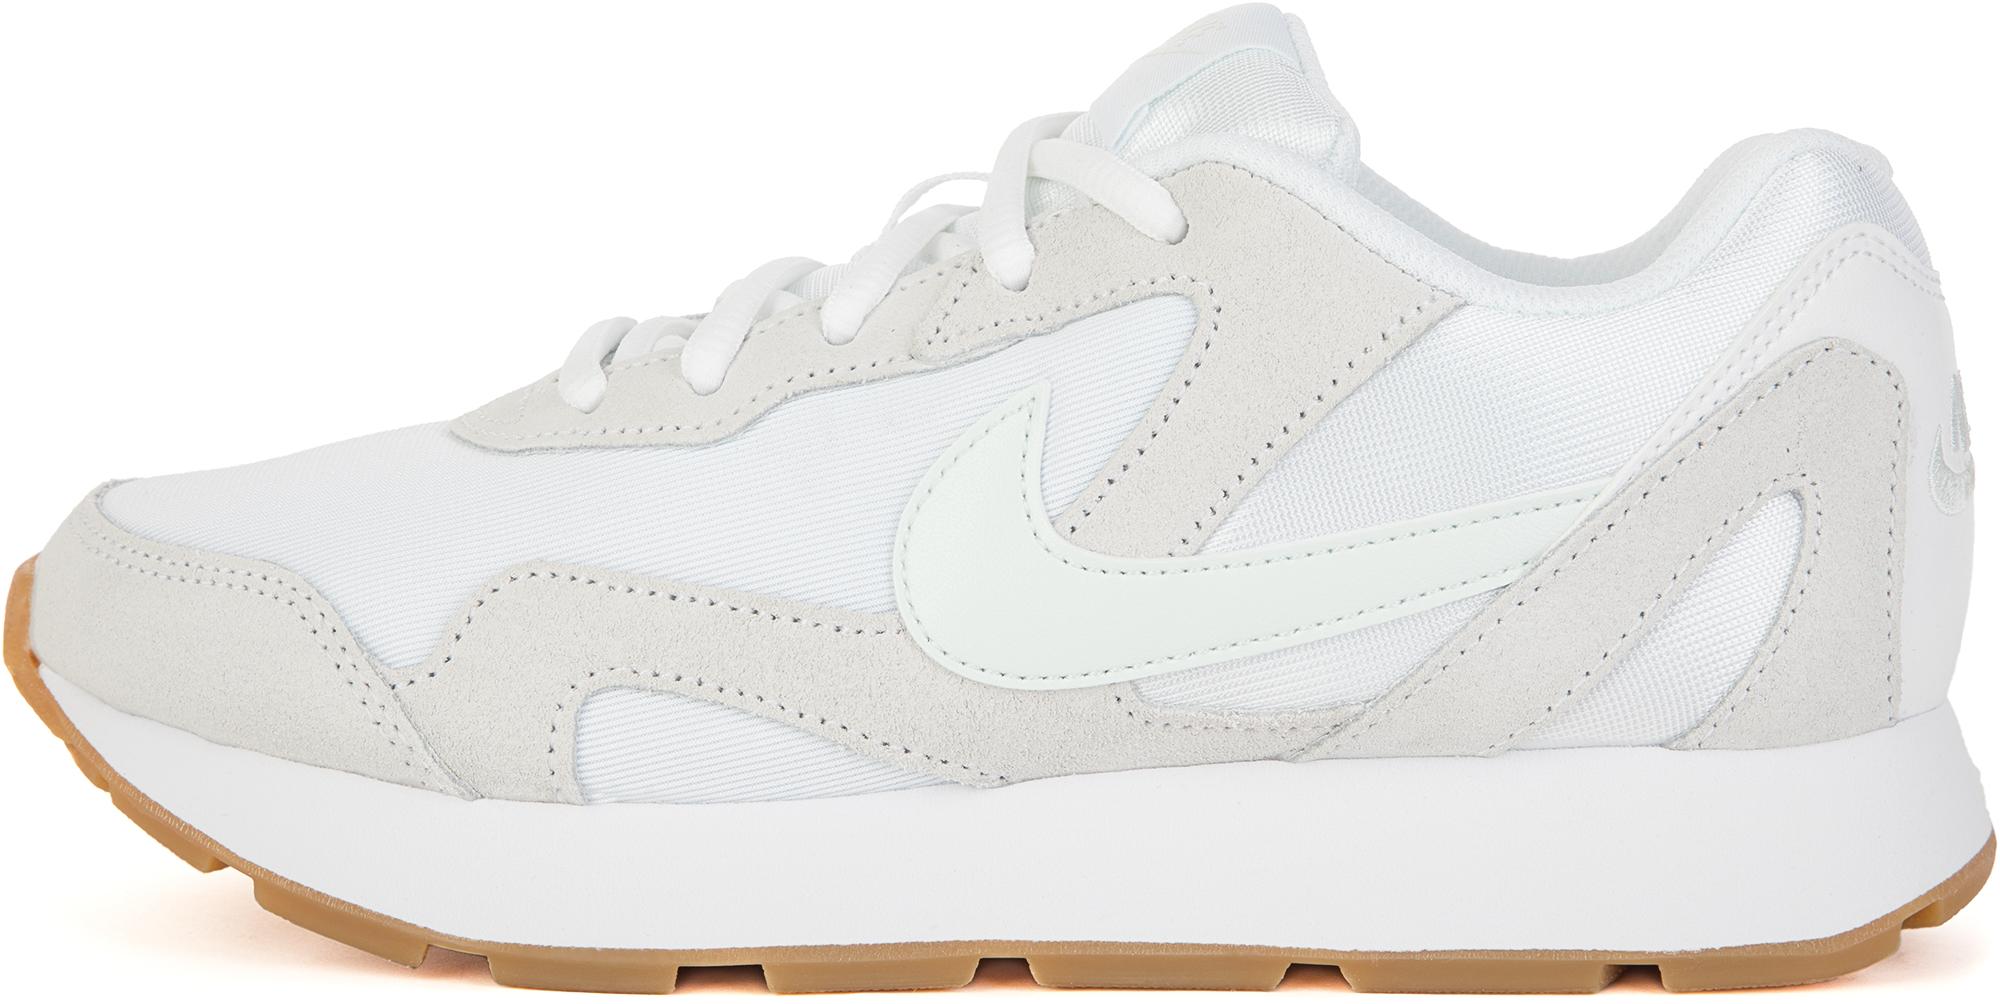 Nike Кроссовки женские Nike Delfine, размер 40